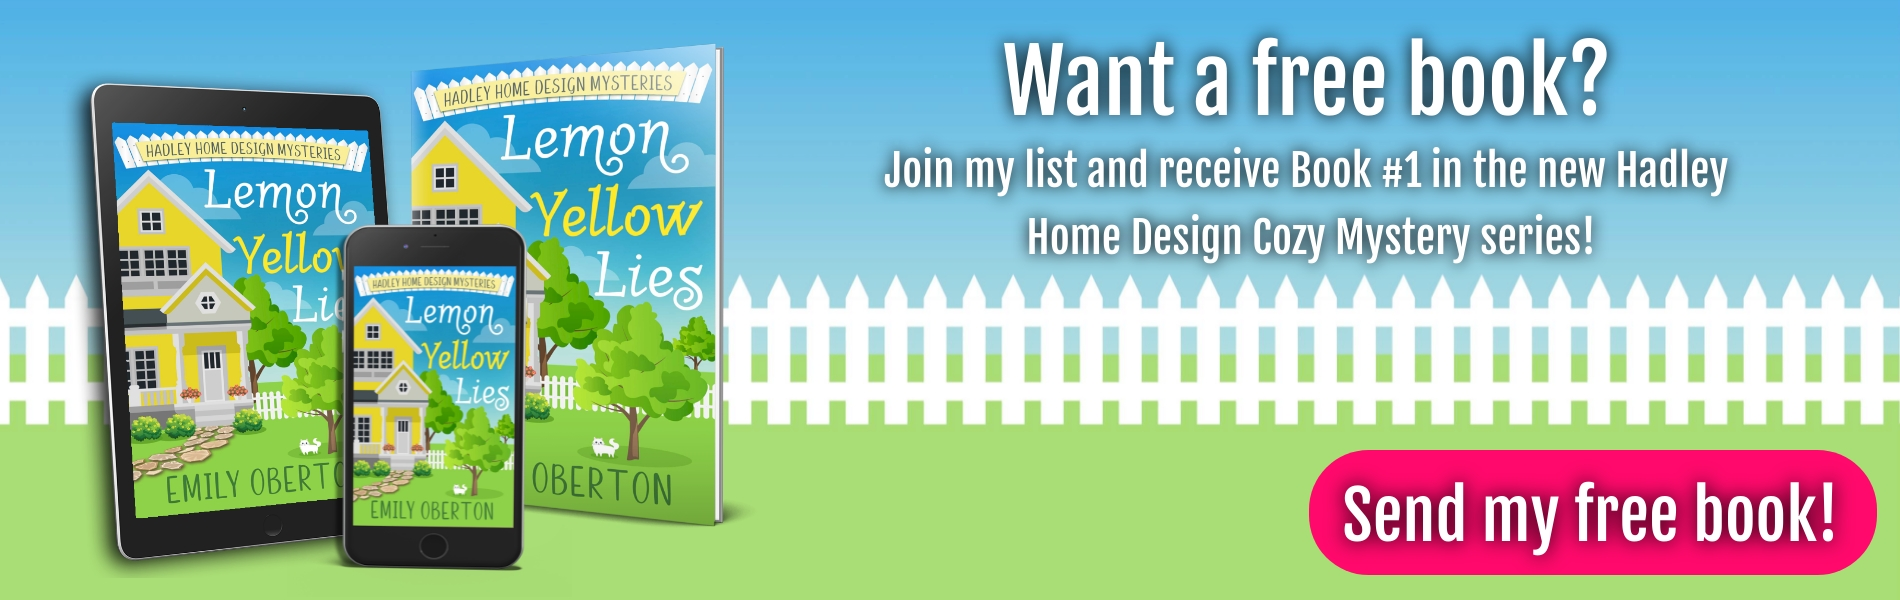 Download Lemon Yellow Lies when you join Emily Oberton's newsletter list